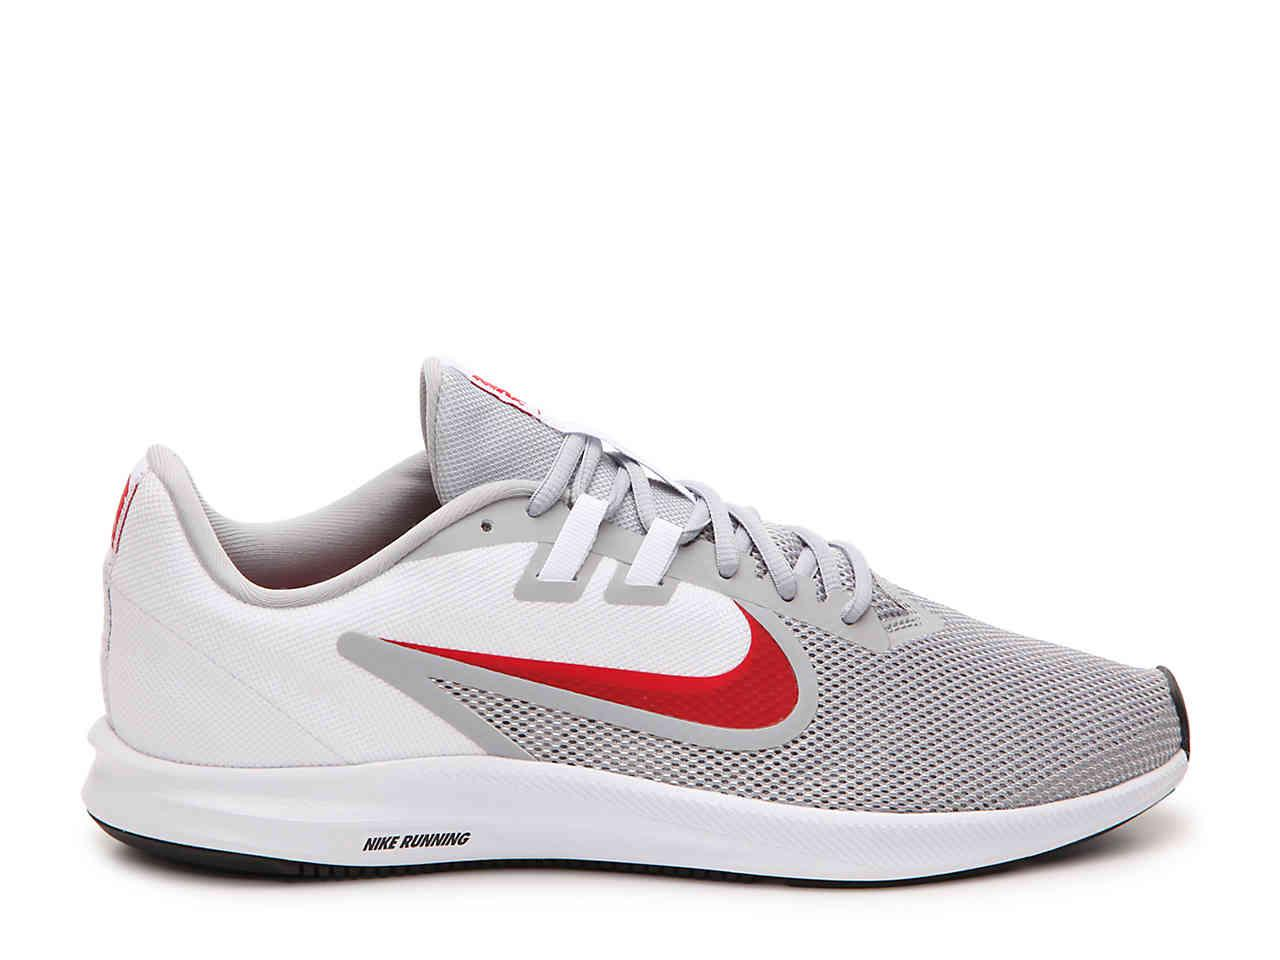 Nike Synthetic Downshifter 9 4e